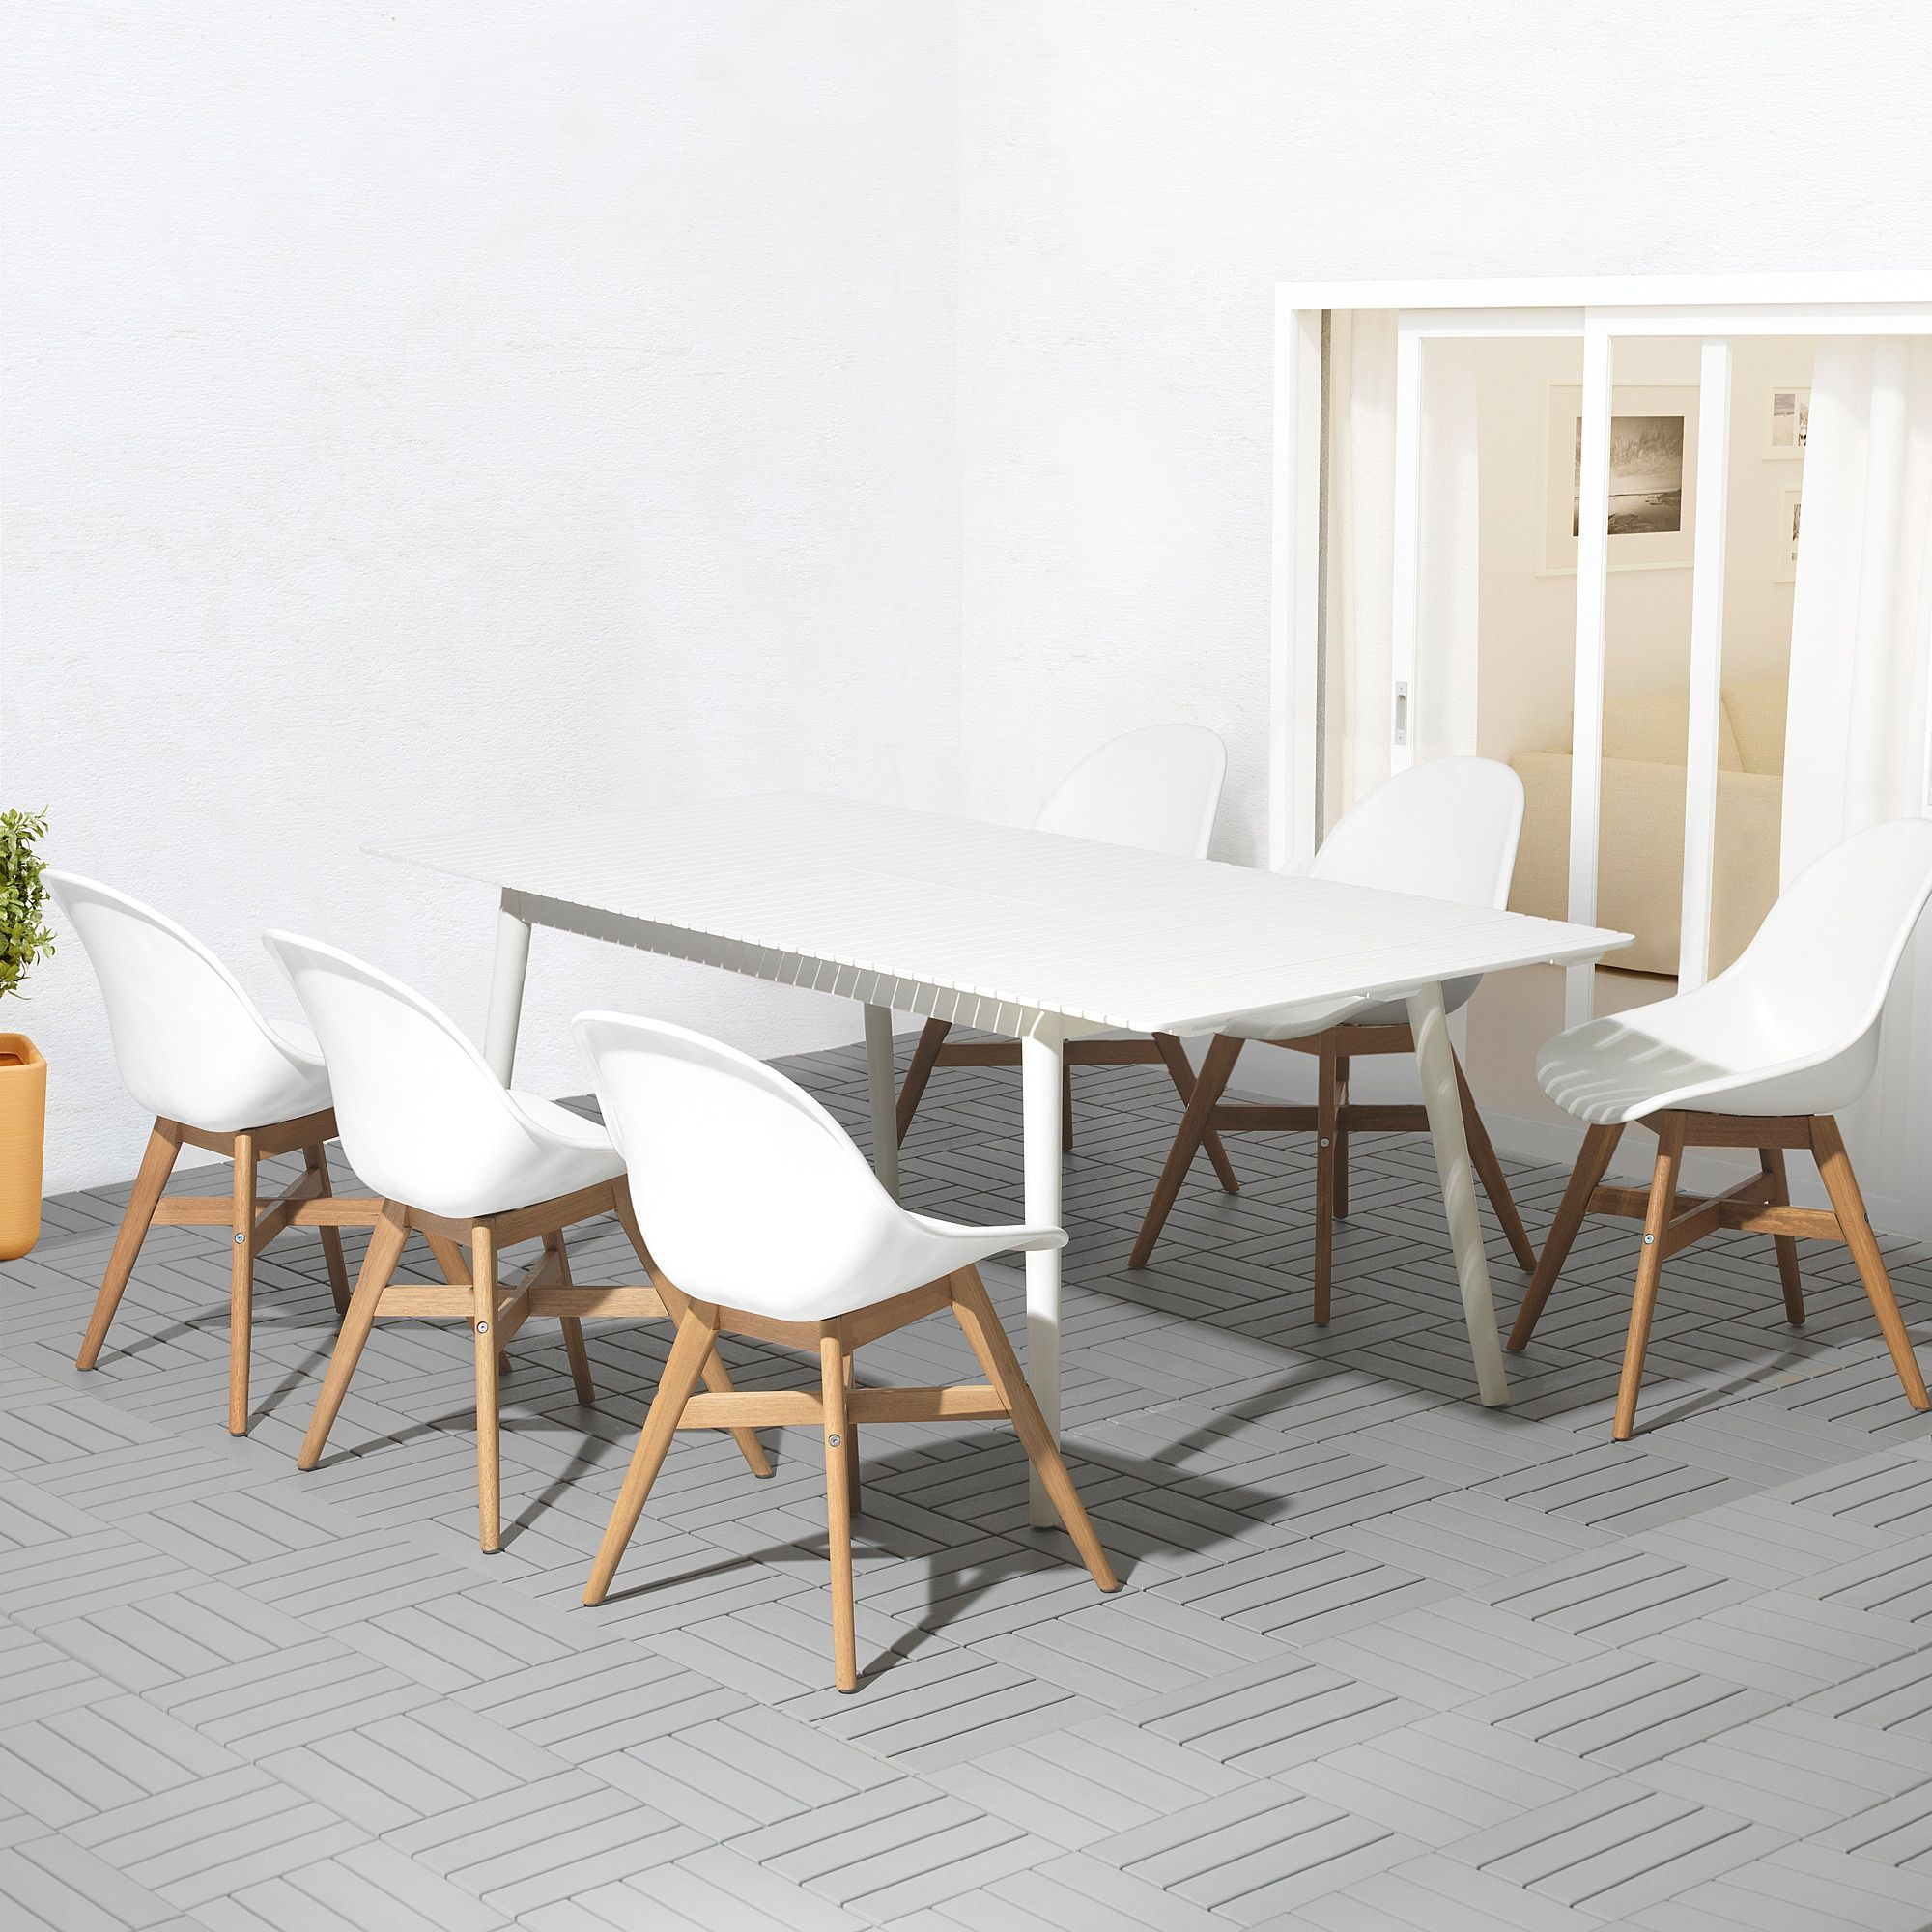 Hattholmen Fanbyn Tisch 4 Stuhle Aussen Weiss Weiss Ikea